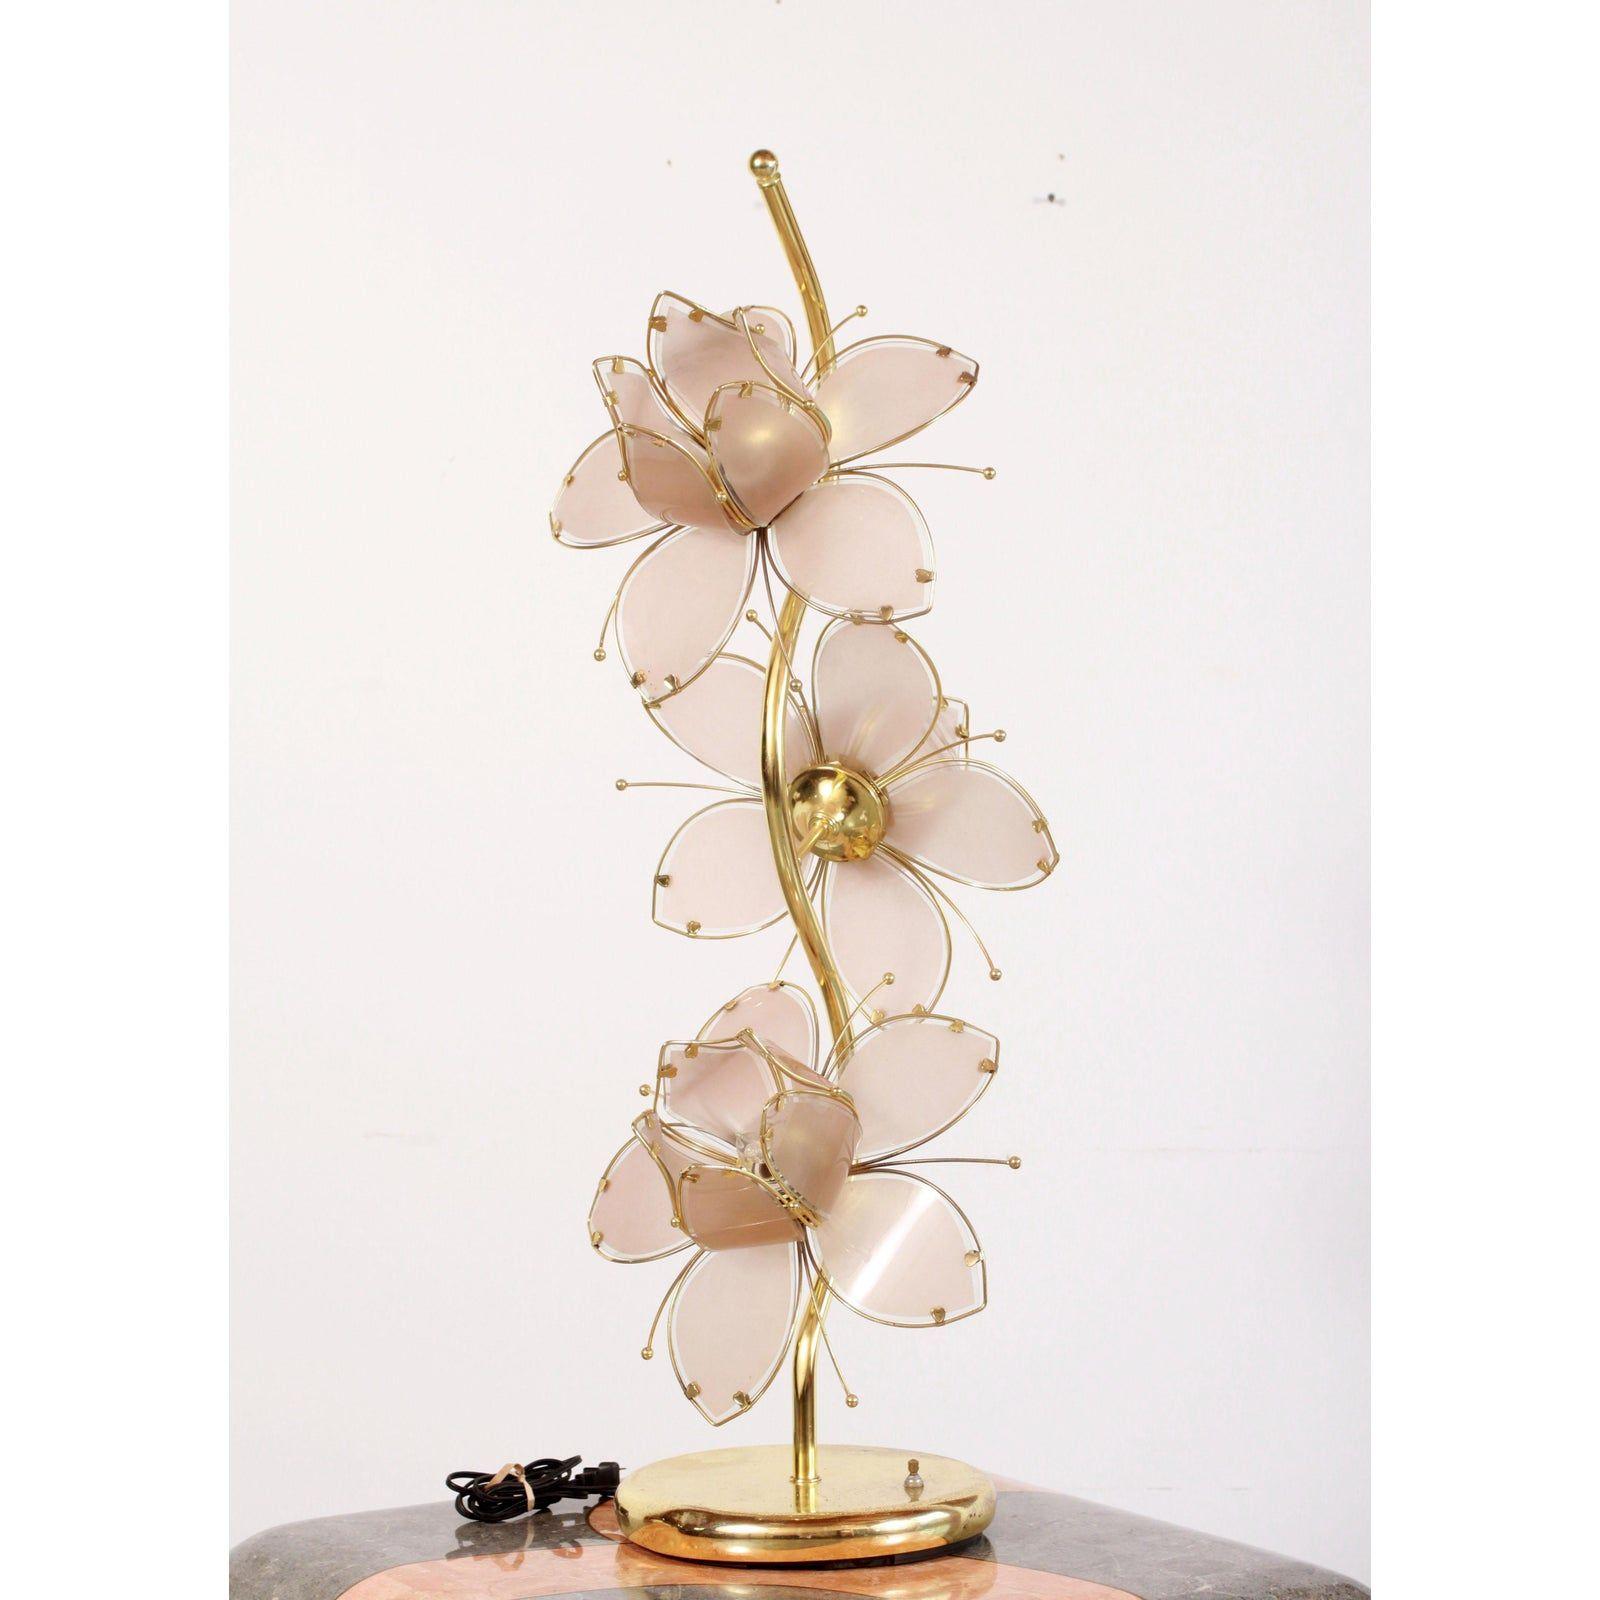 C 1980 S Vintage Brass Pink Italian Glass Lotus Table Lamp In 2020 Vintage Brass Statement Lamp Table Lamp